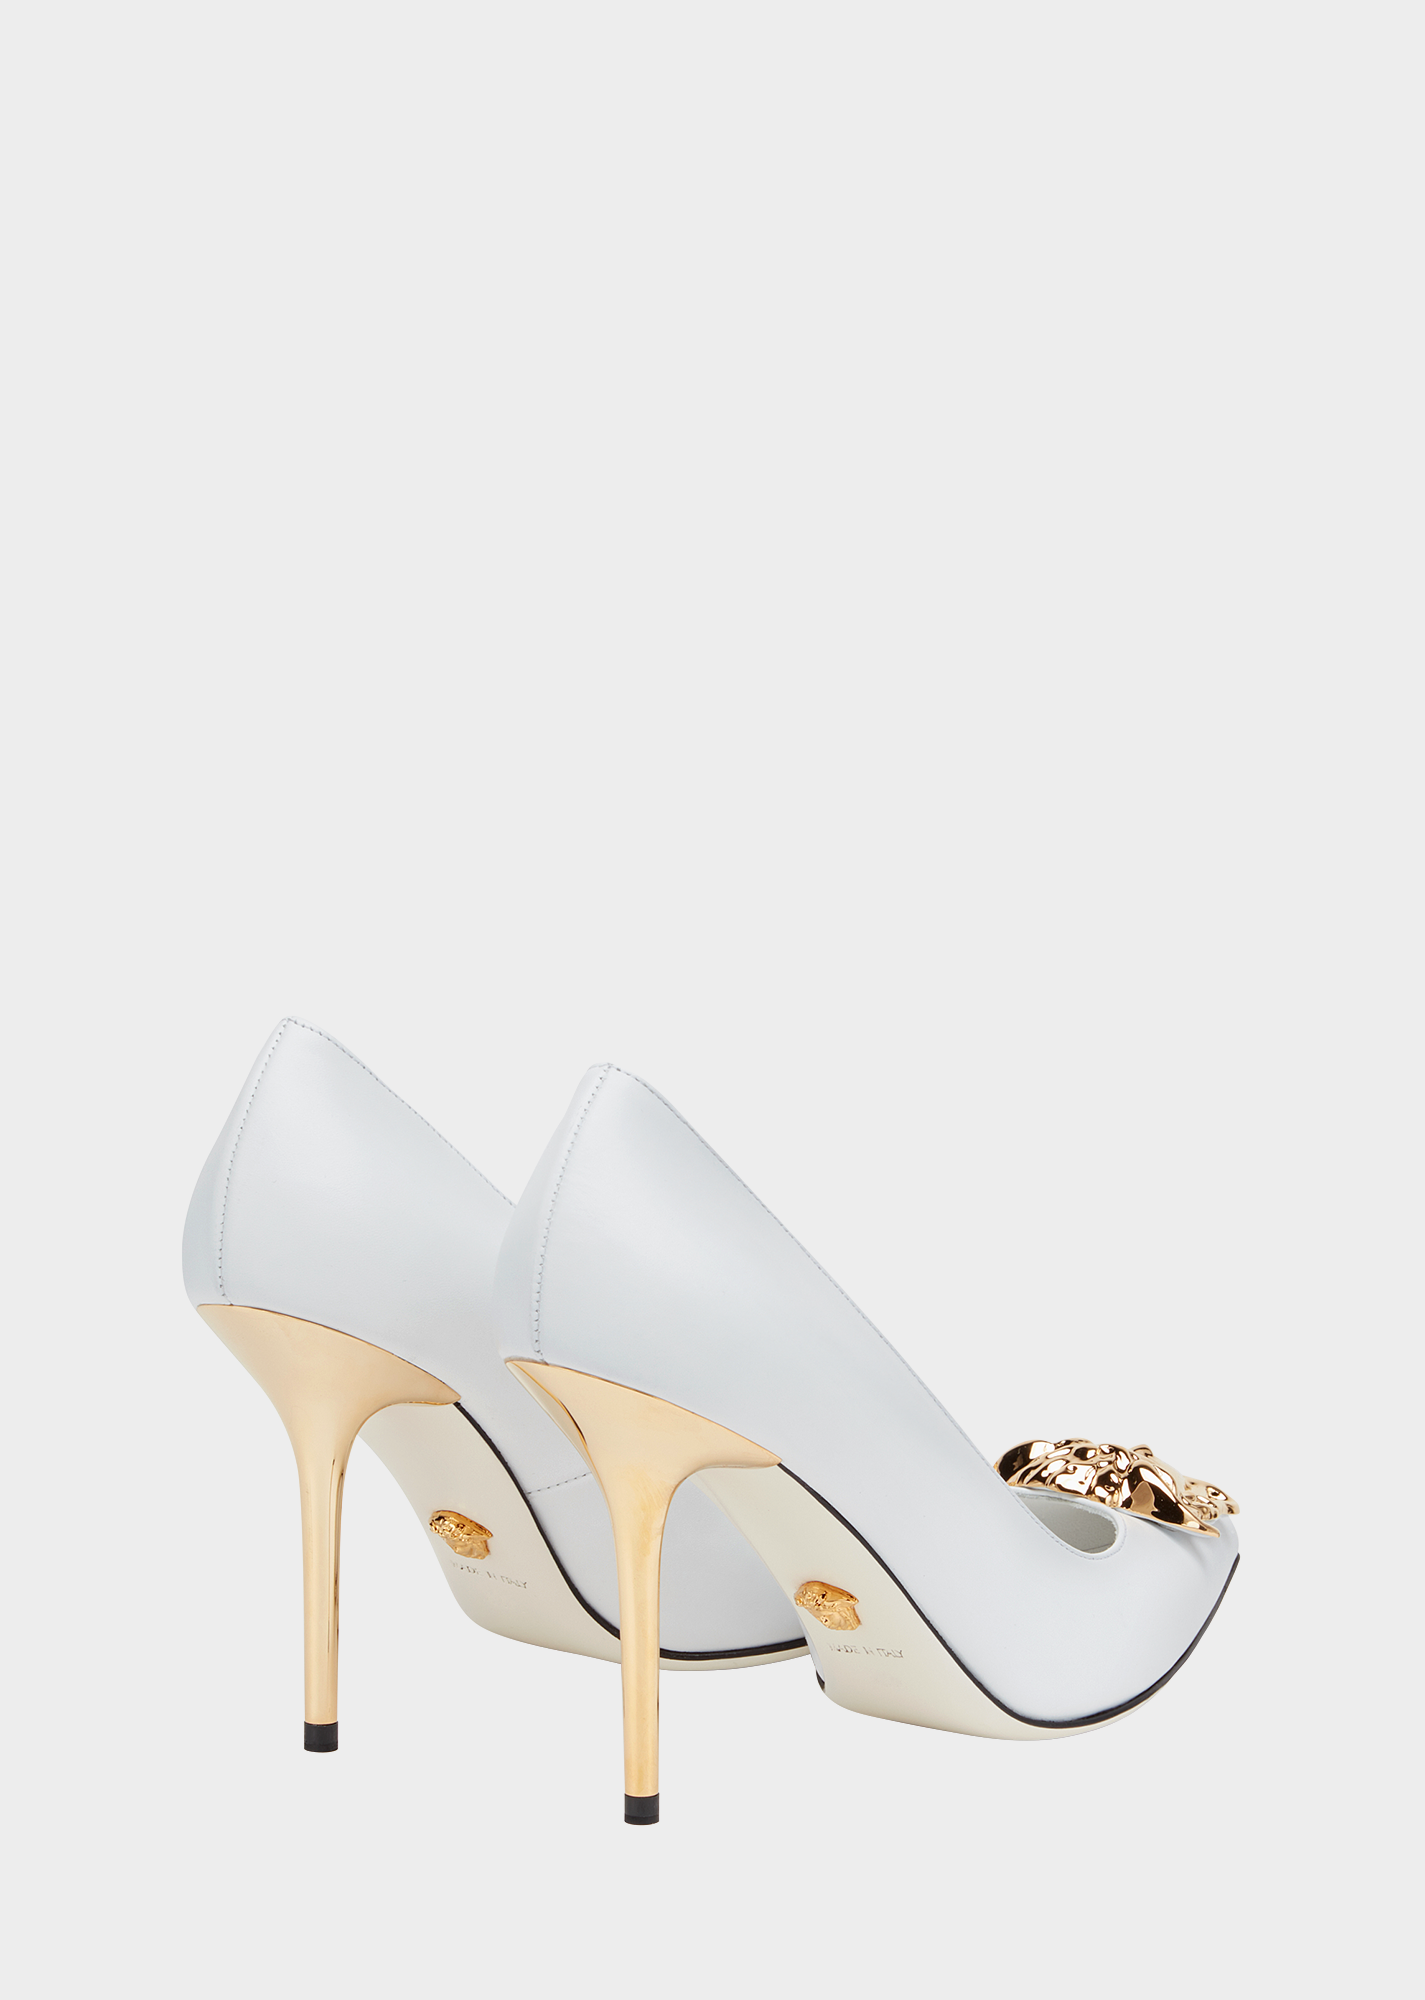 Versace  scarpe donna moda 2017 - VelvetStyle 11499b2607a